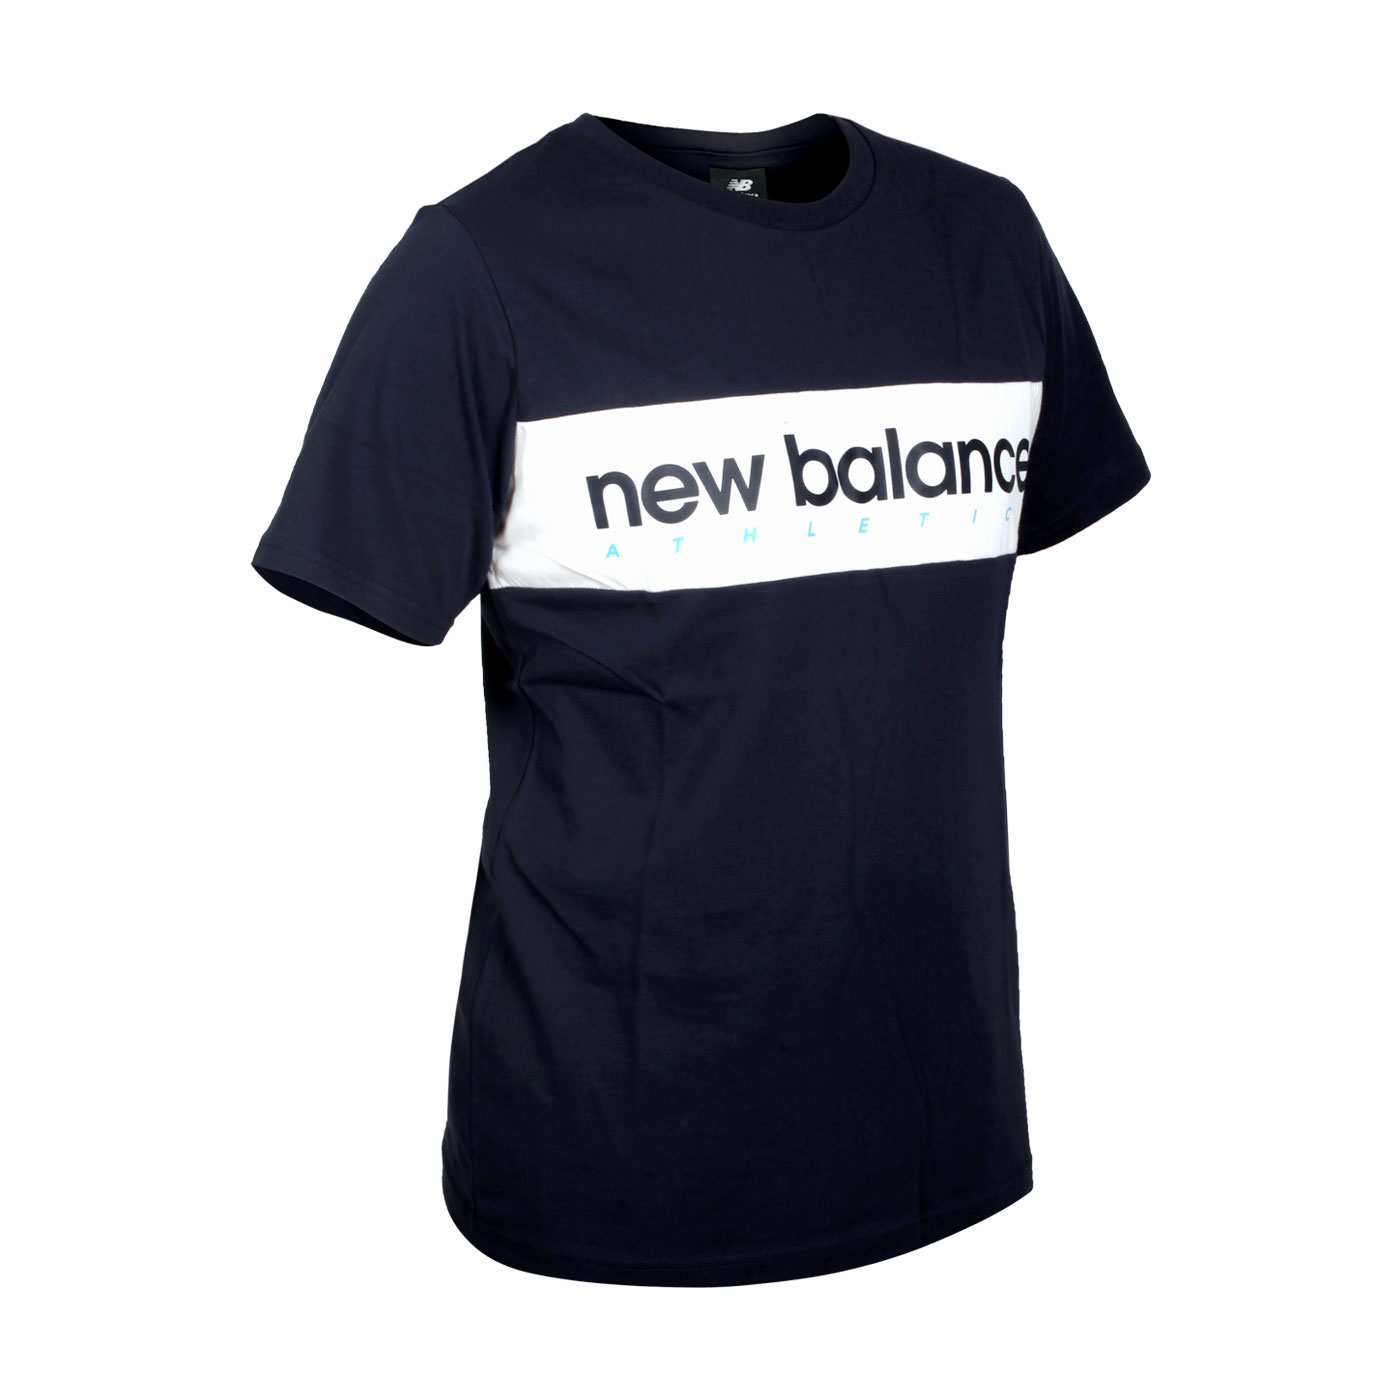 NEW BALANCE 男款橫條品牌短袖T恤 AMT11548ECL